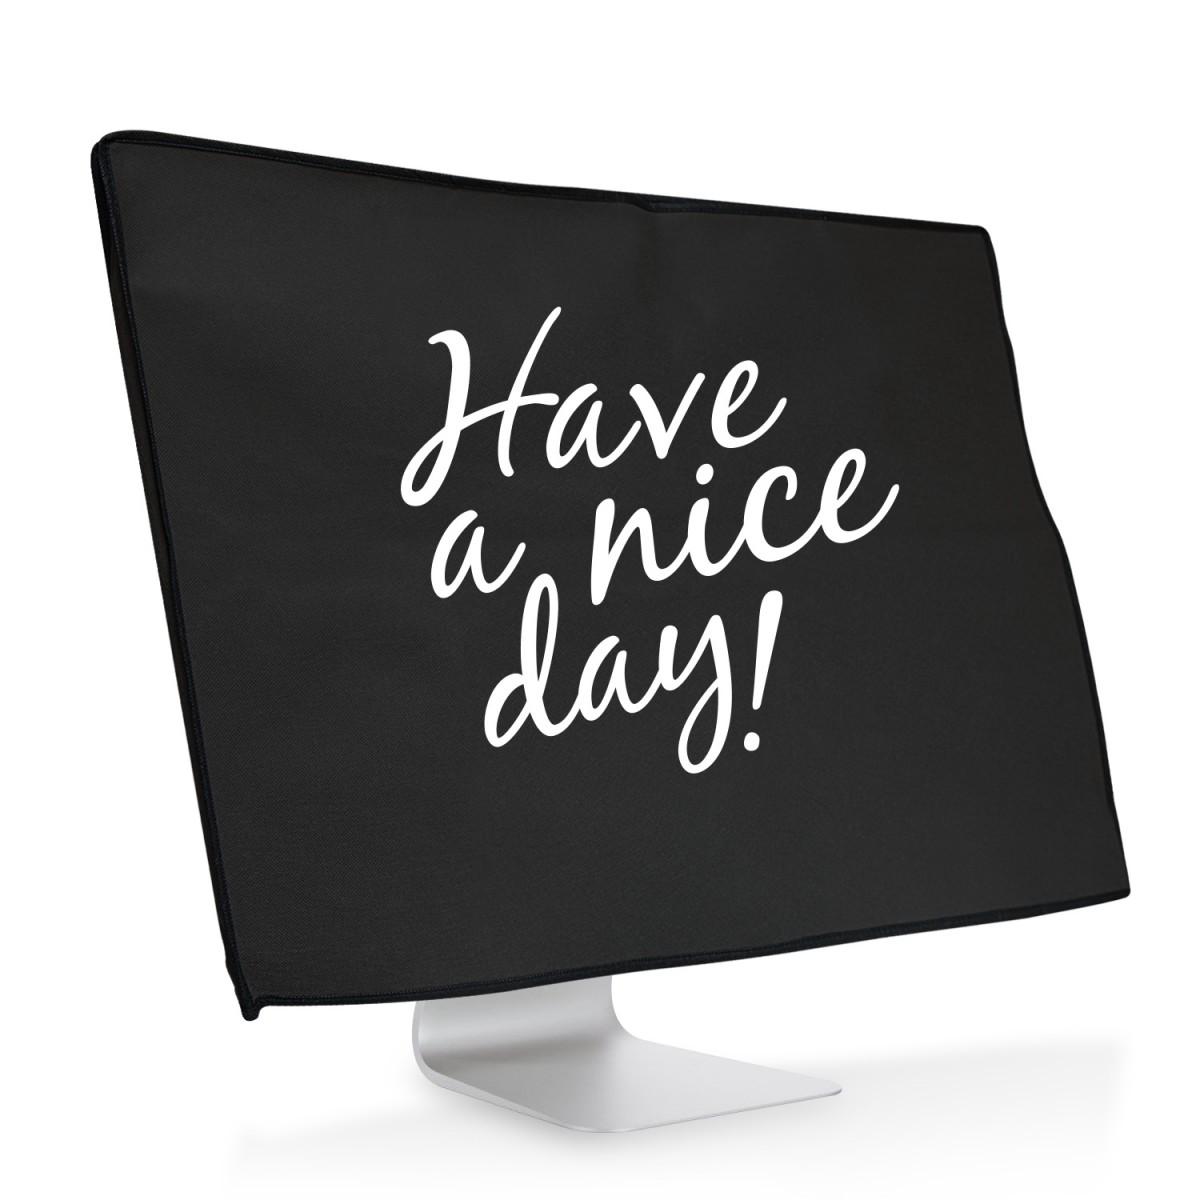 Ochranný návlek Have a nice day! na iMac 27